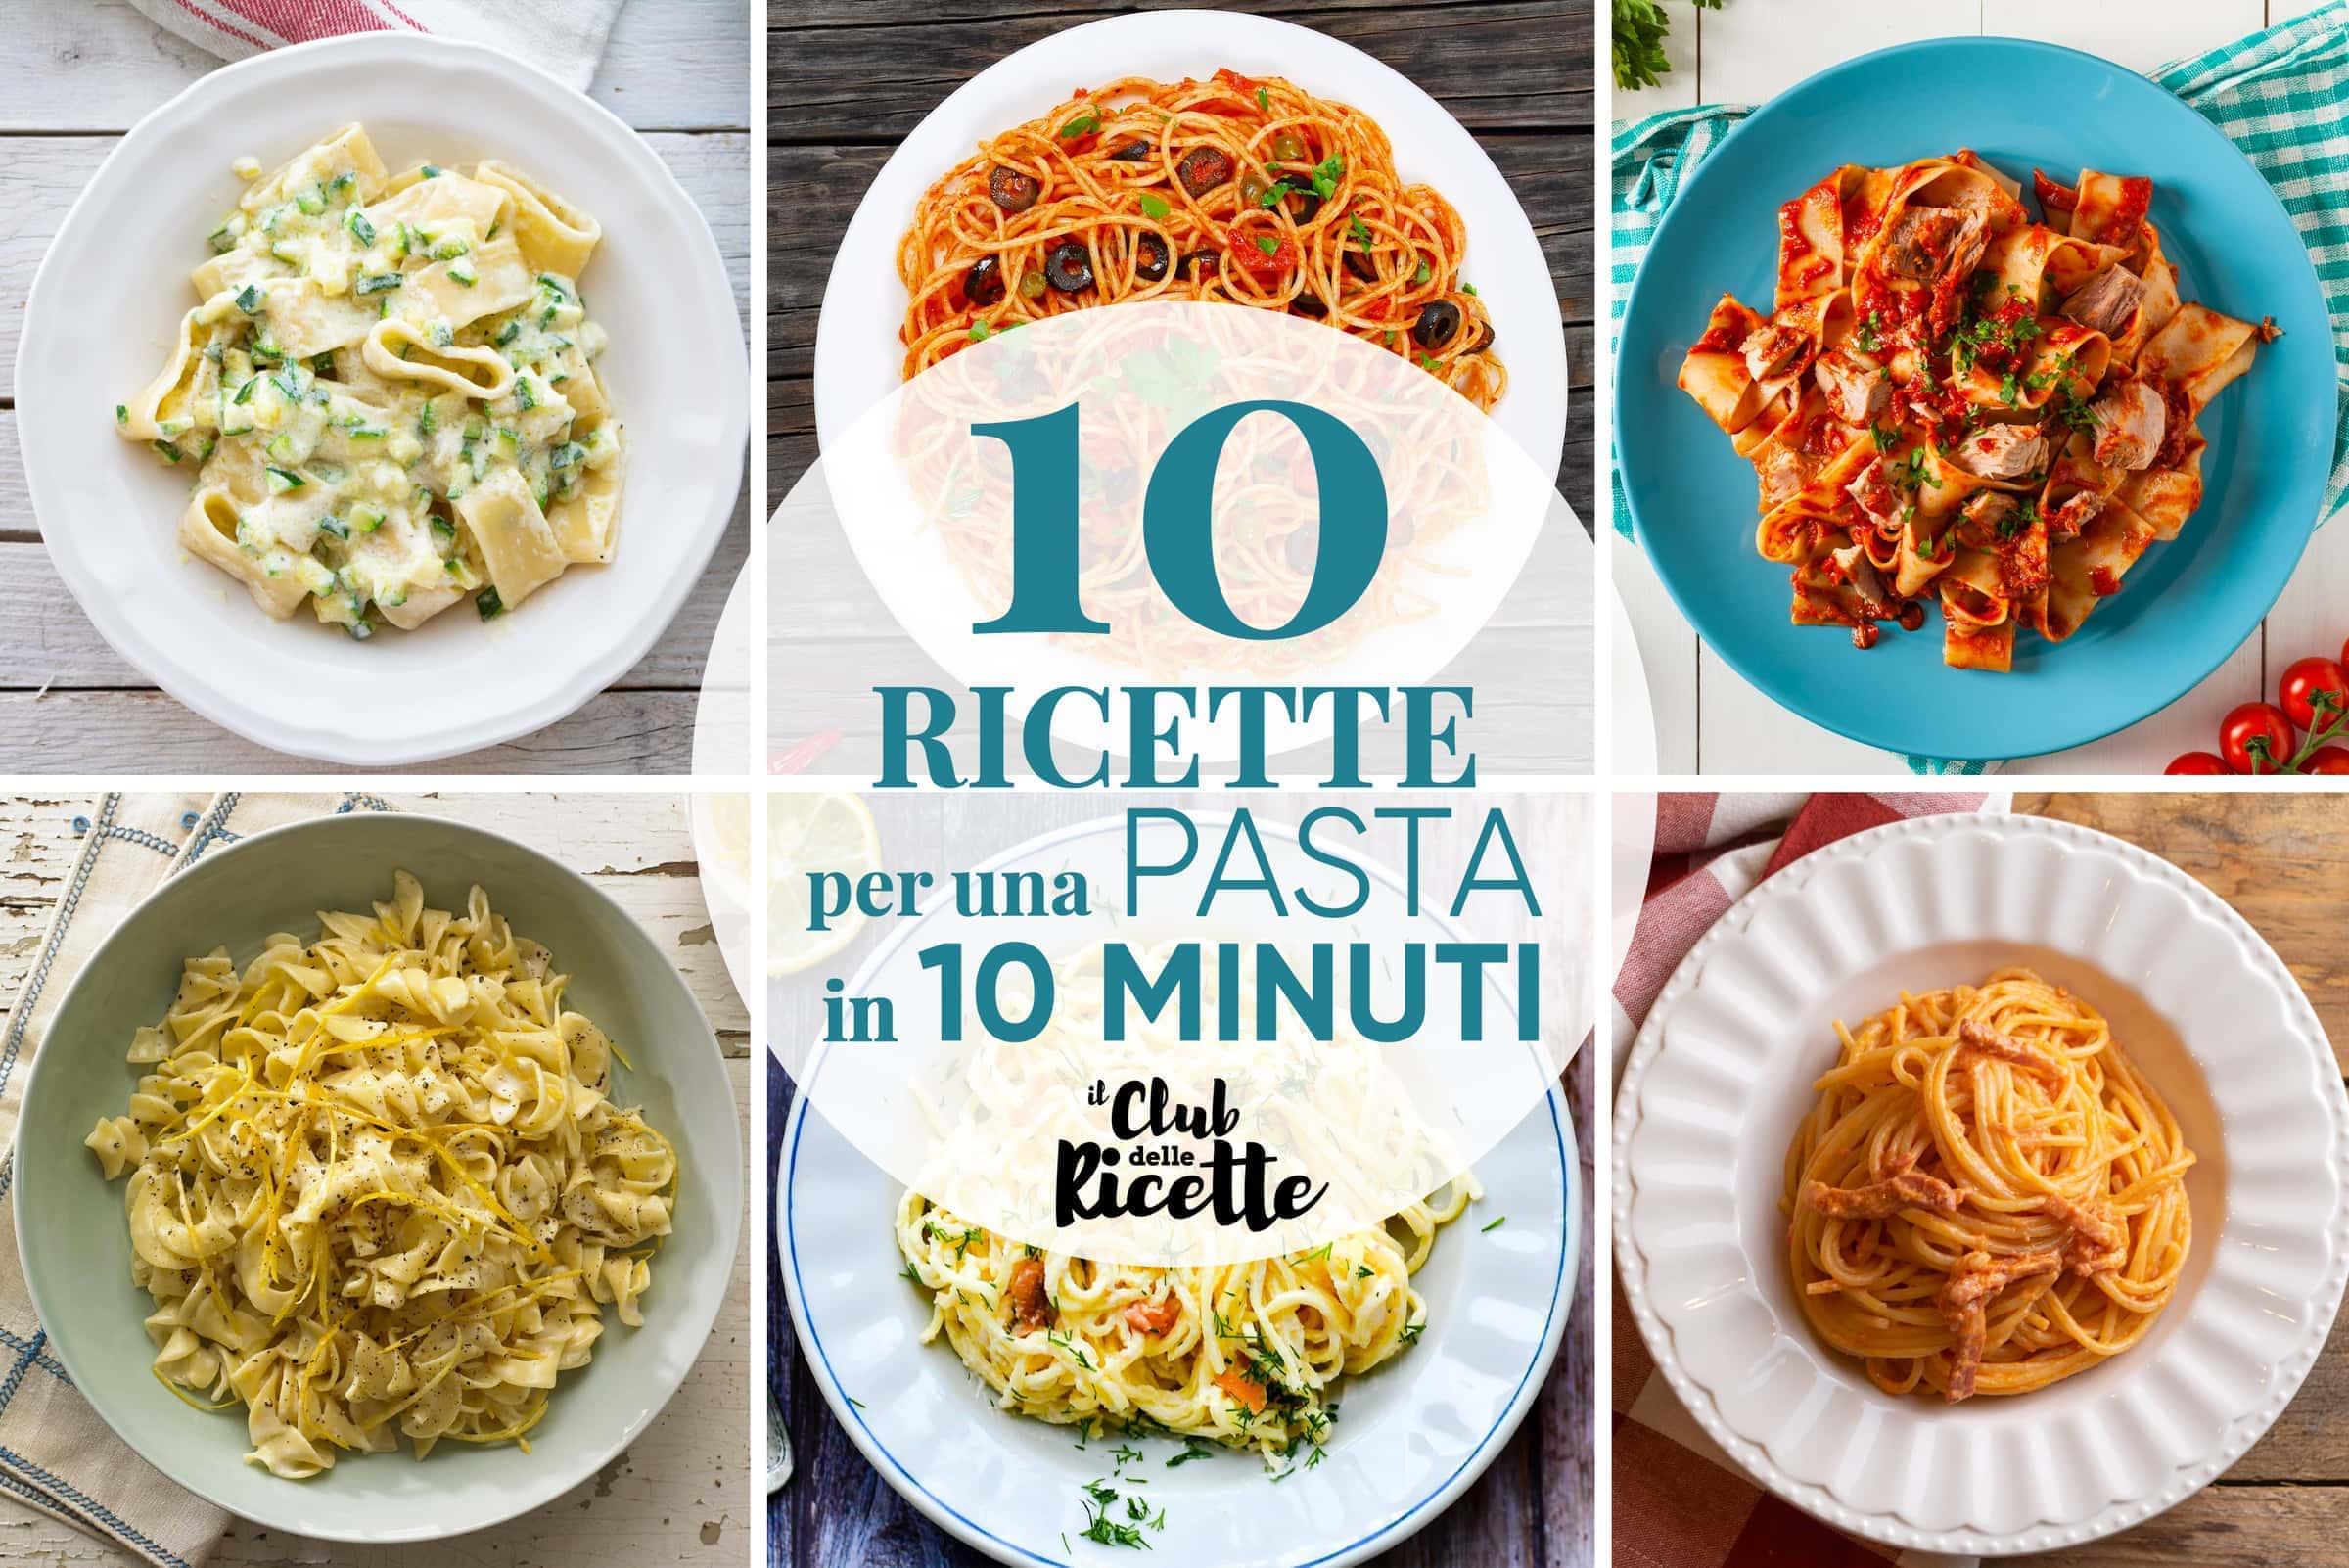 Ricette Per Pasta In 10 Minuti